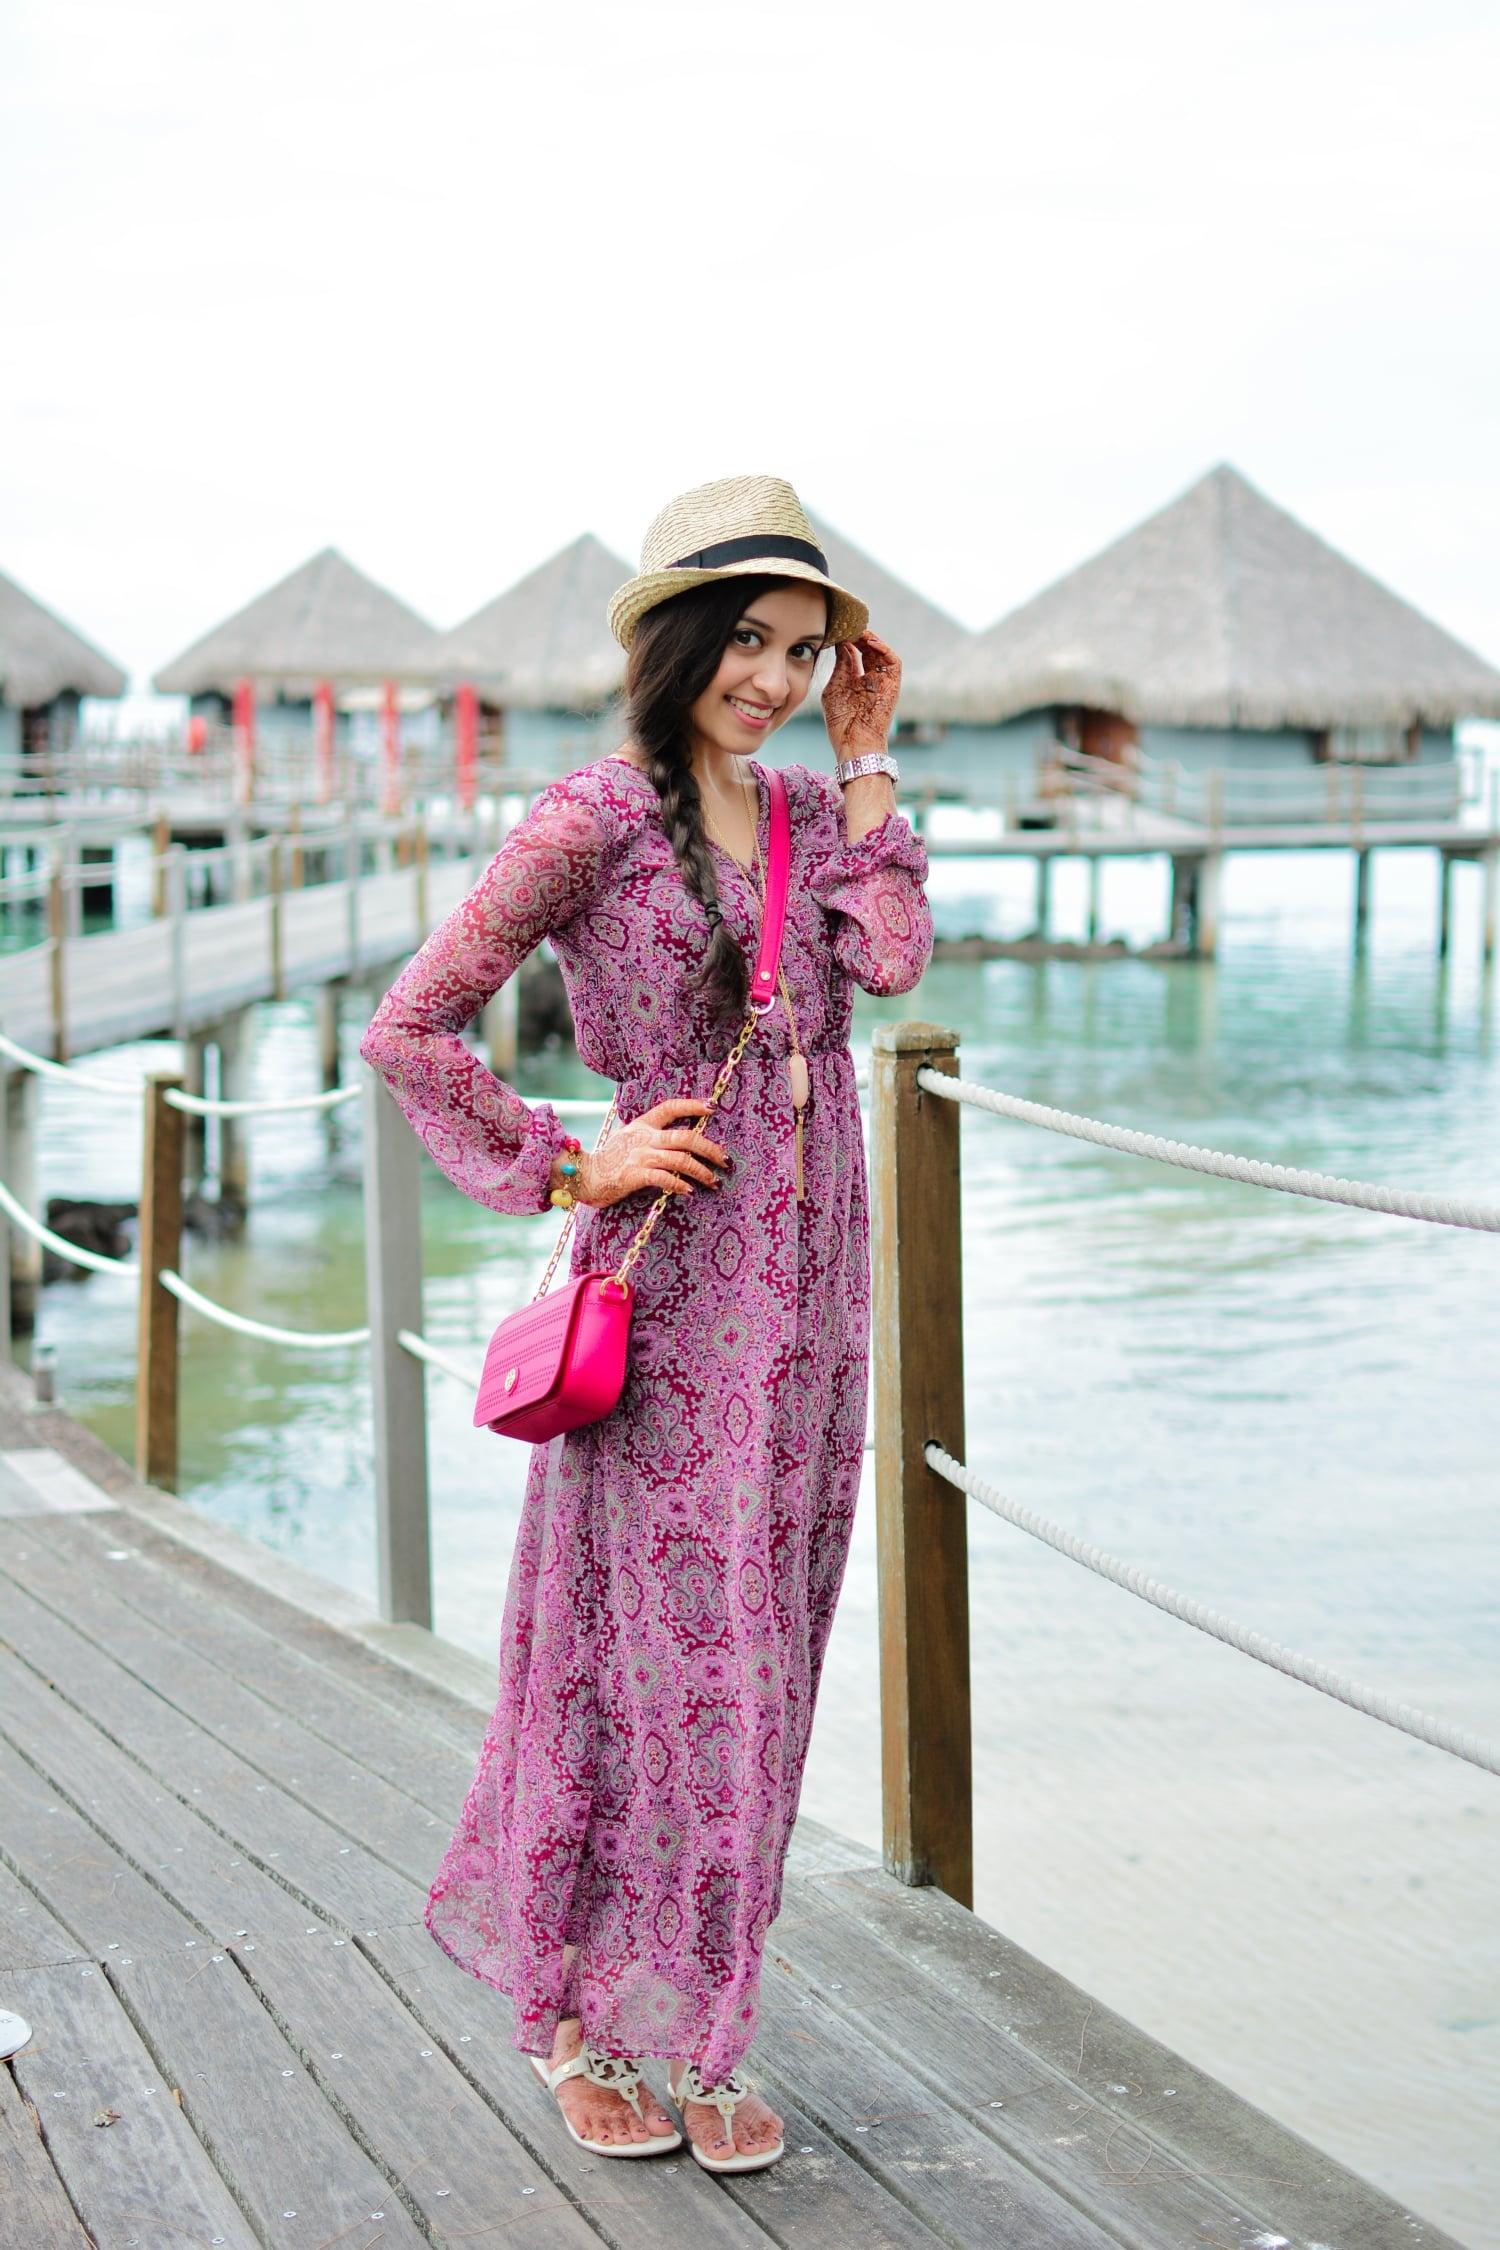 purple paisley maxi dress vacation bora bora tahiti beach summer weather resort fedora tory burch sandals cross body hot pink